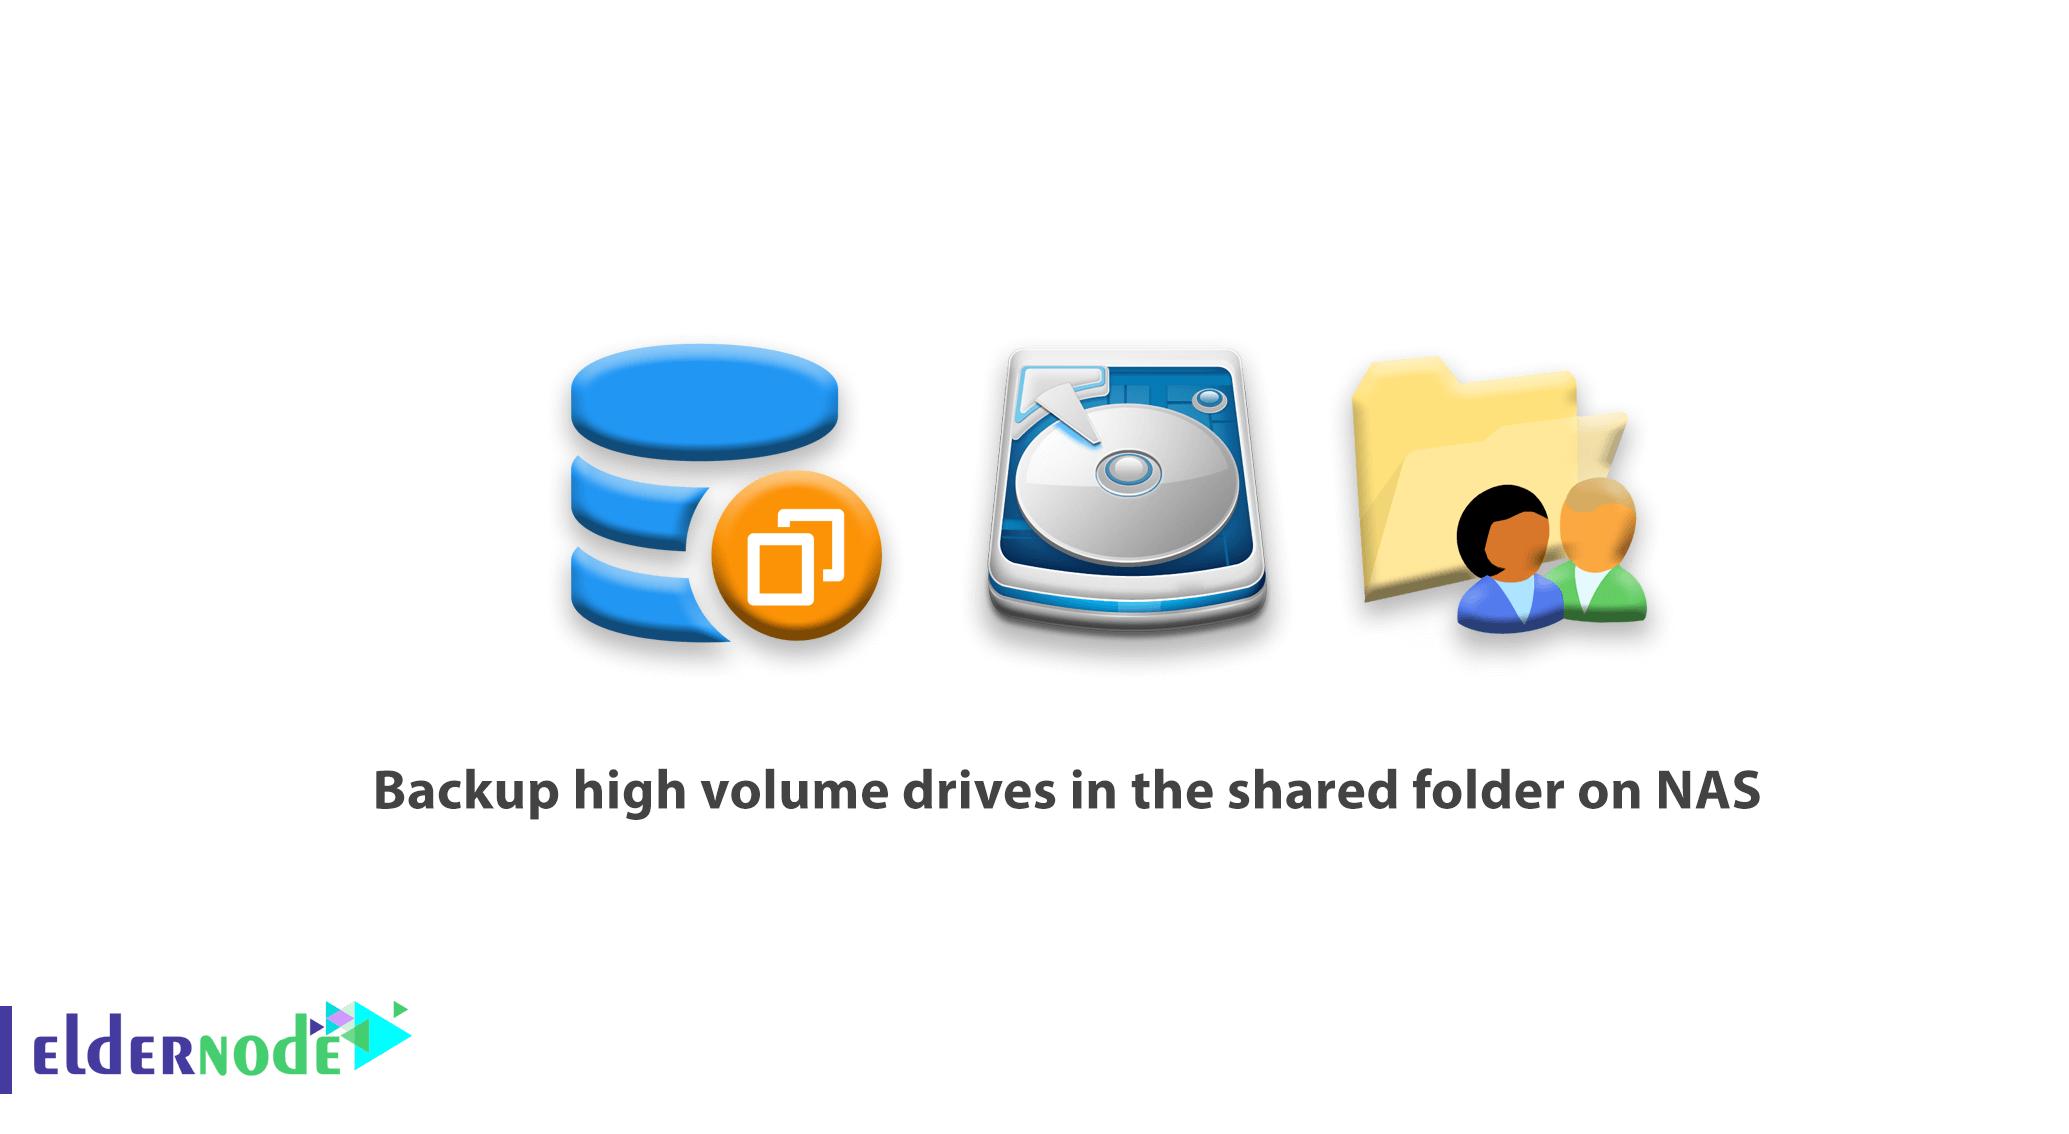 Backup high volume drives in the shared folder on NAS